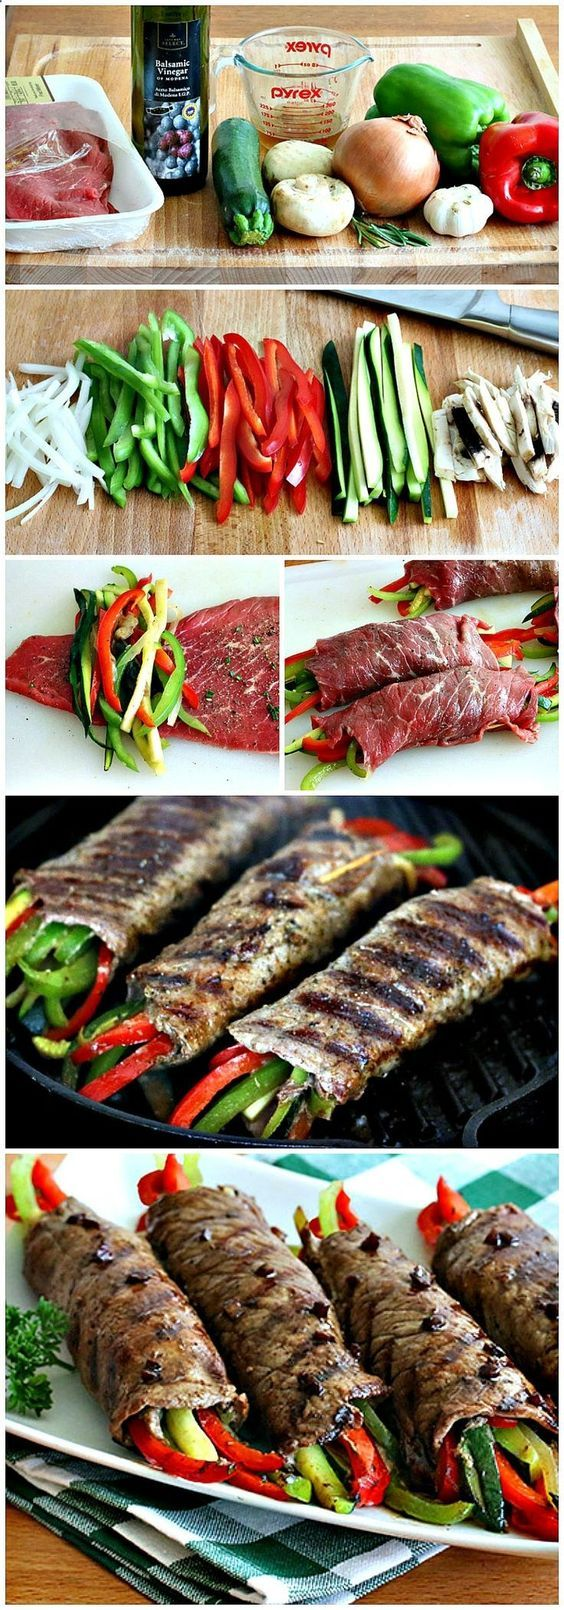 Balsamic Glazed Steak Rolls using Progresso™ beefflavored broth